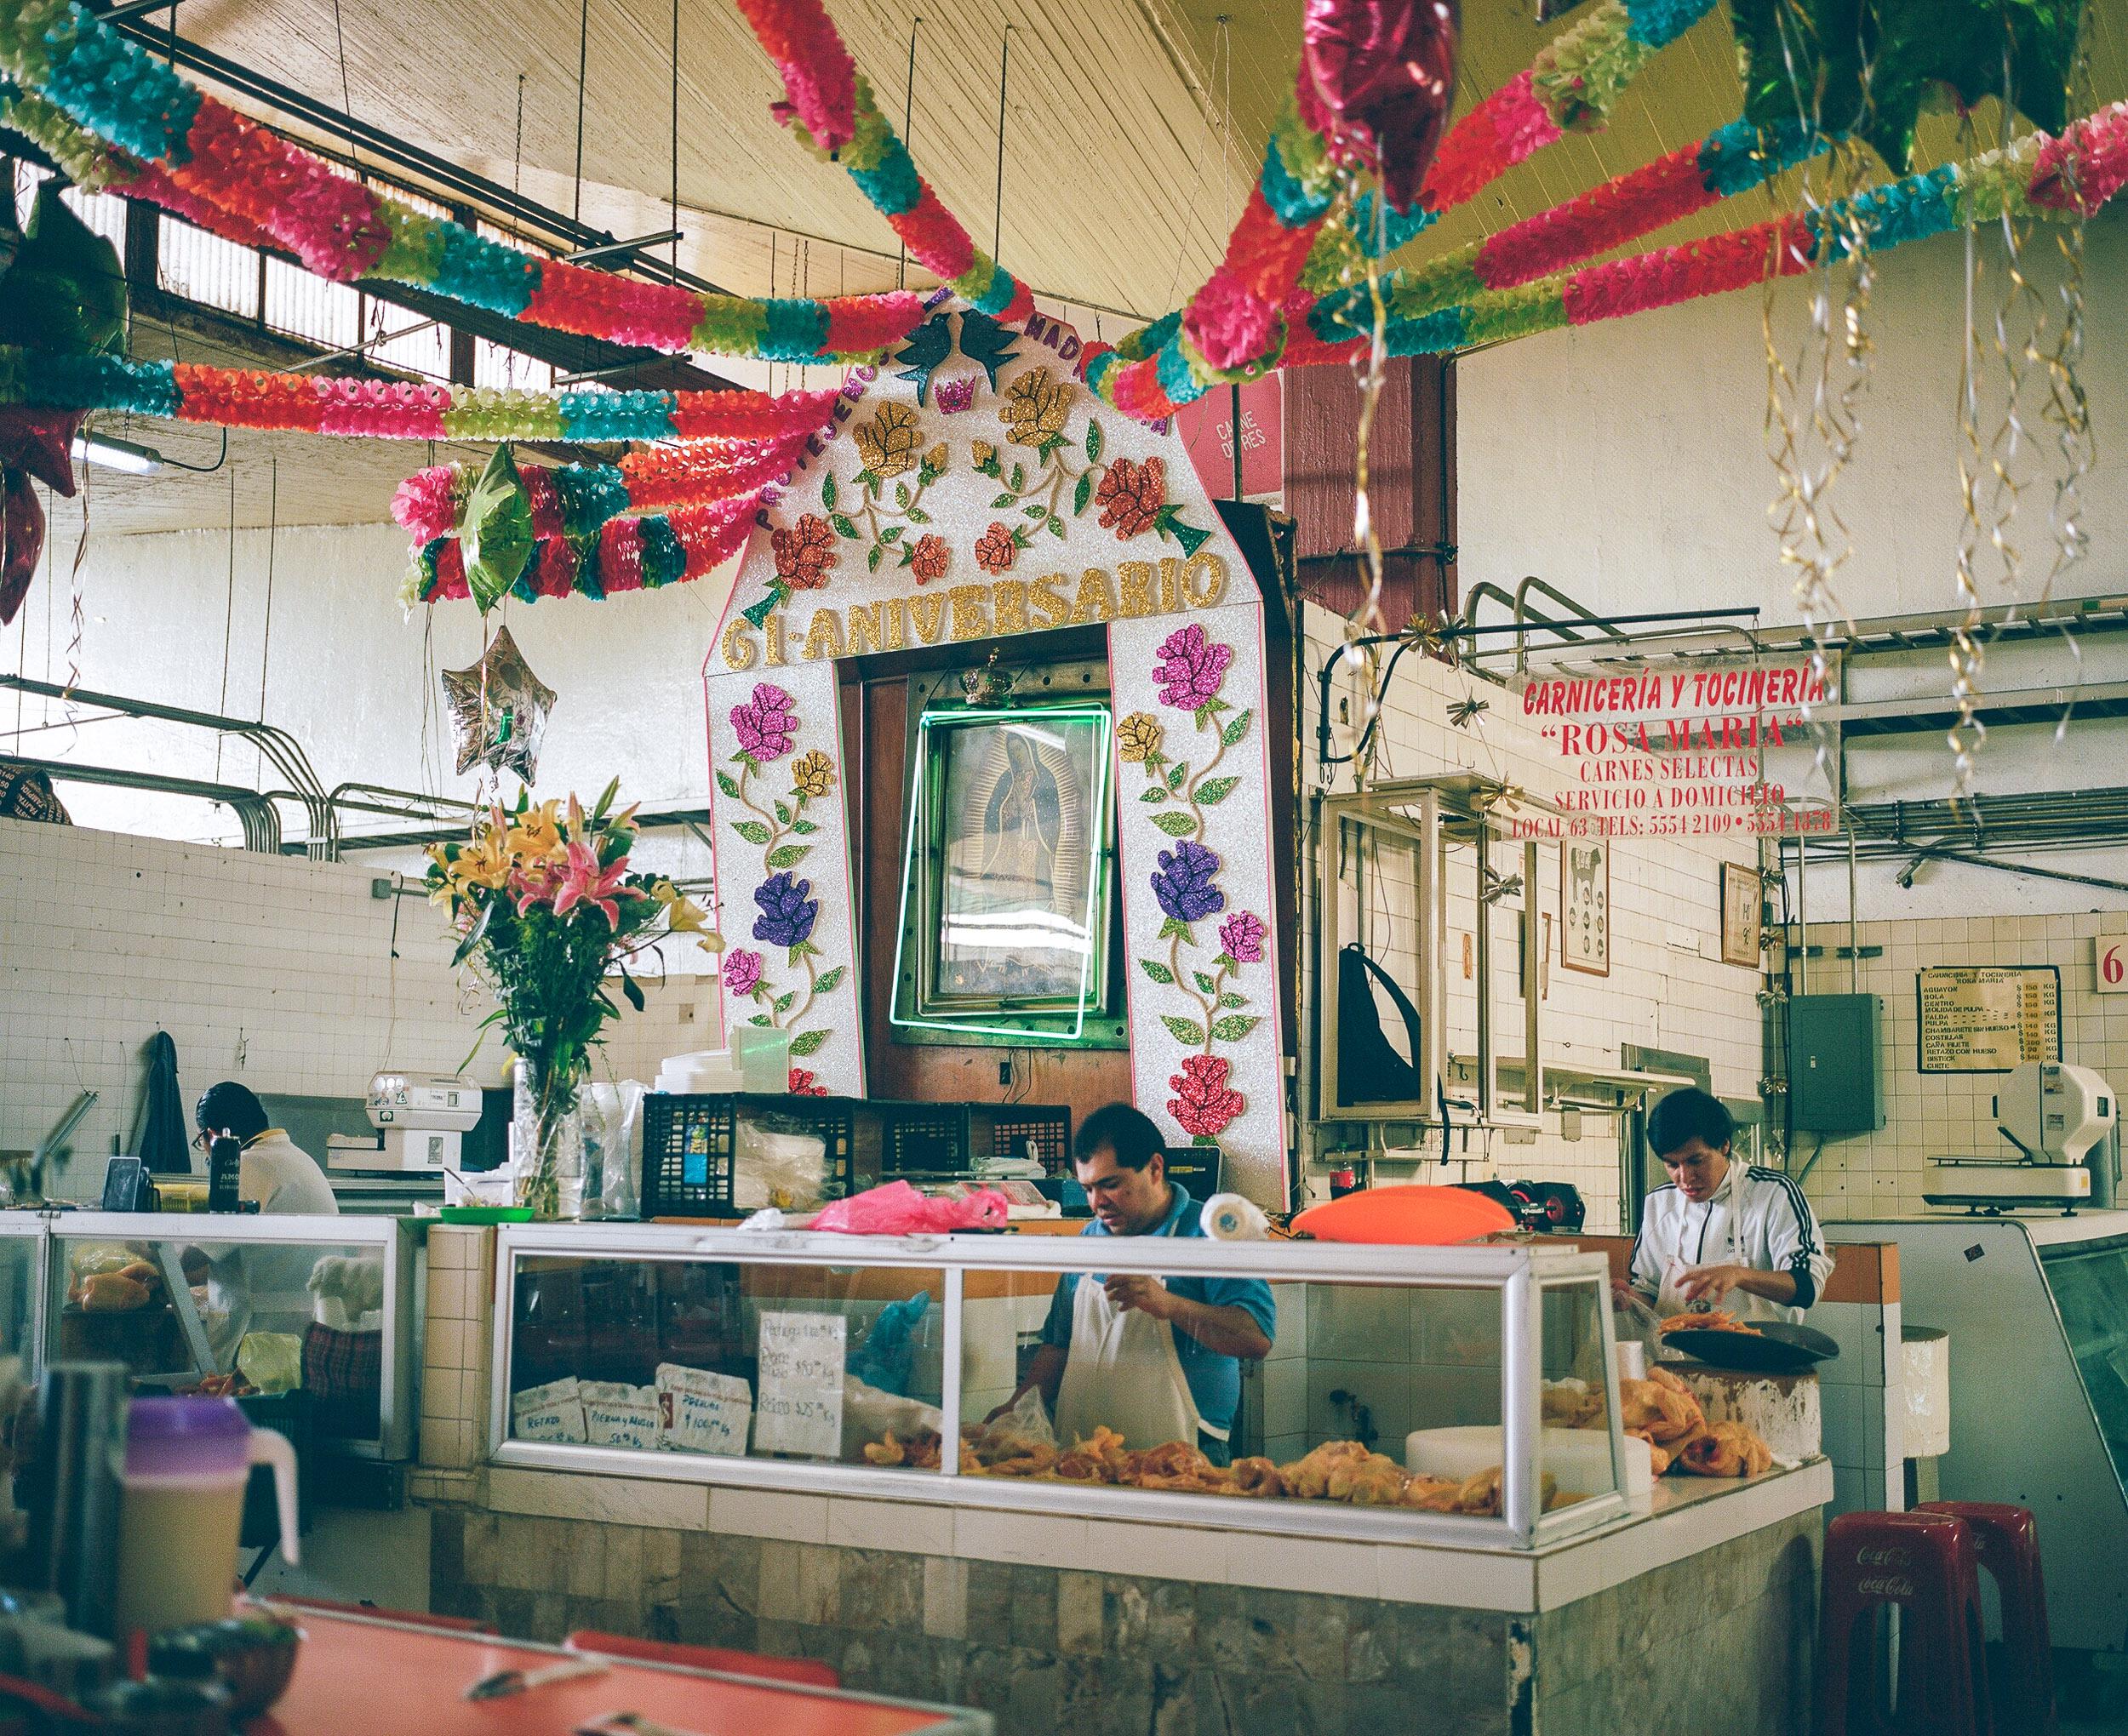 mexico_city_dAutremont_web_17.jpg